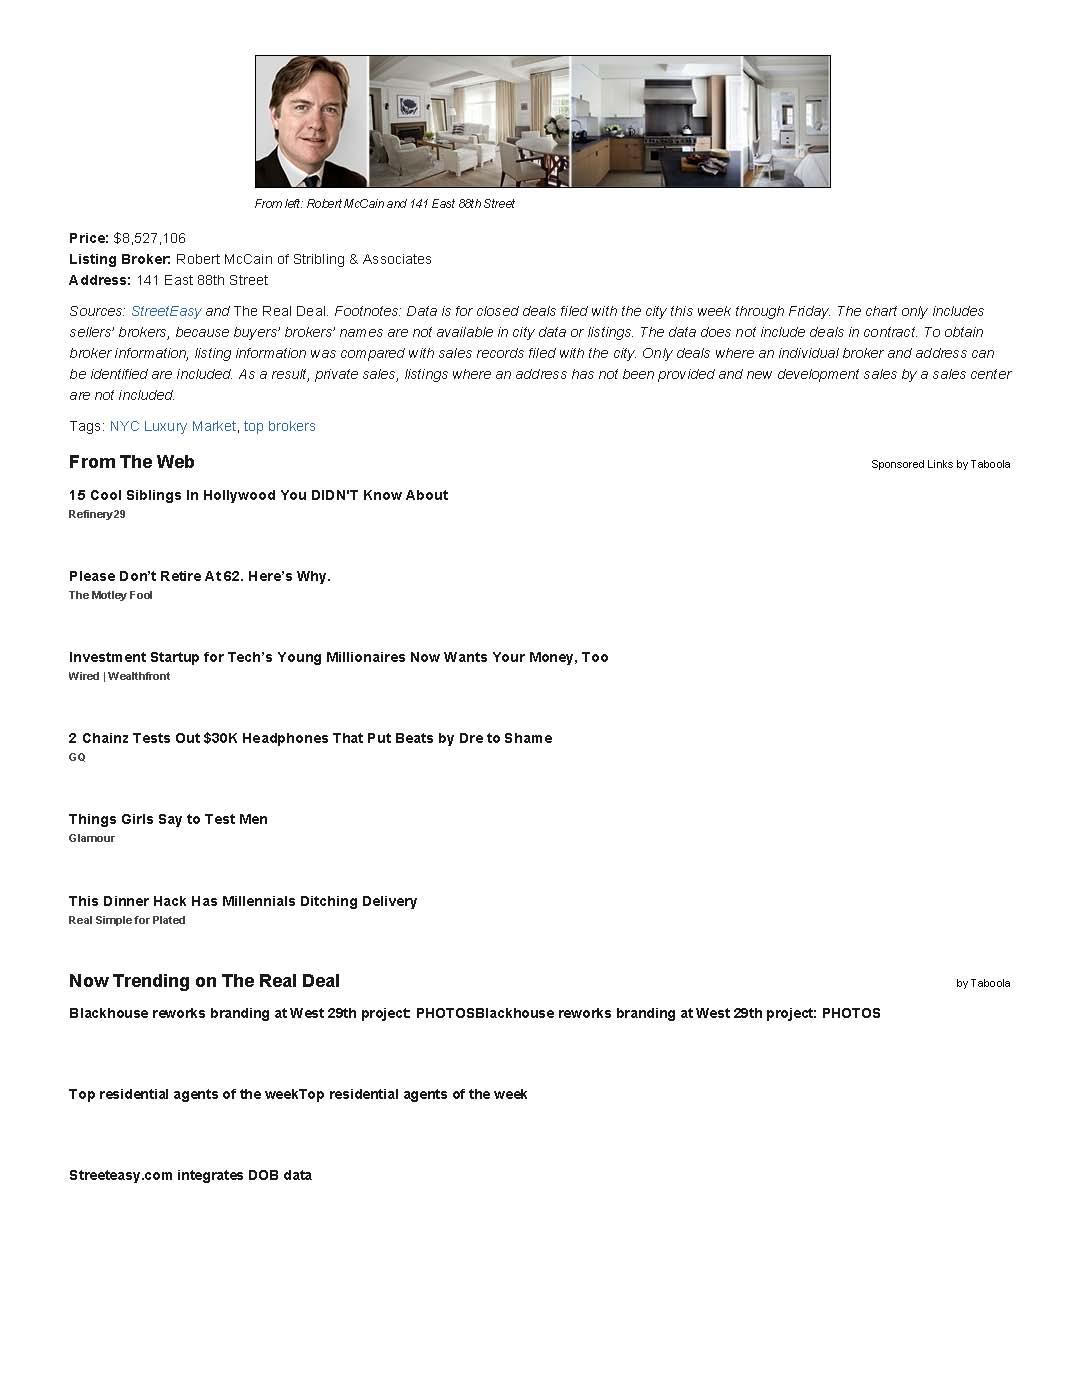 TRD Top Real Estate Brokers NYC _ August 30, 2013_Page_2.jpg